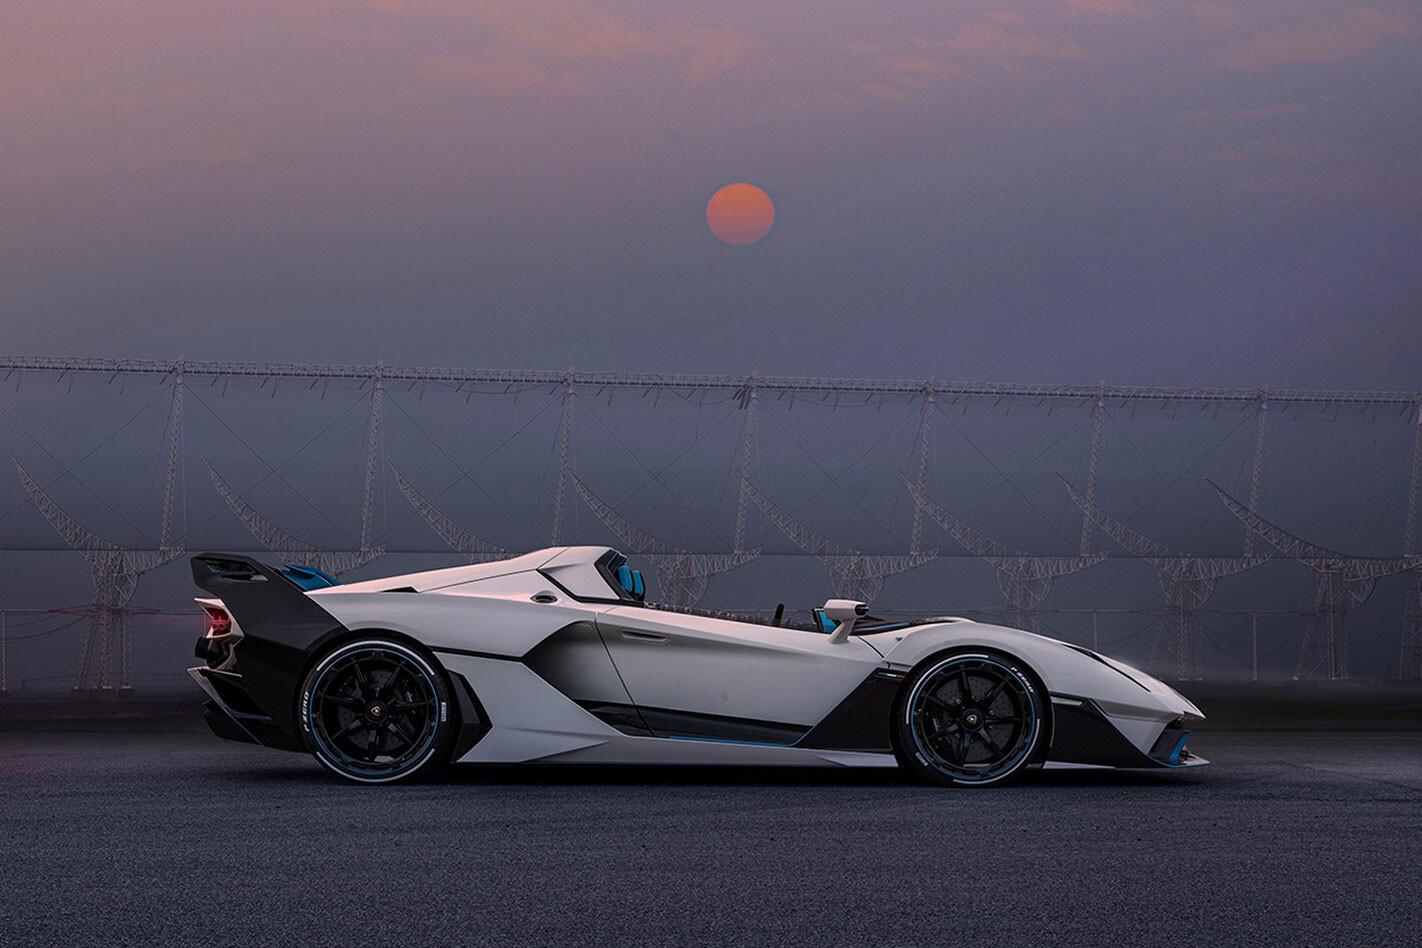 Lamborghini hybrid 2025